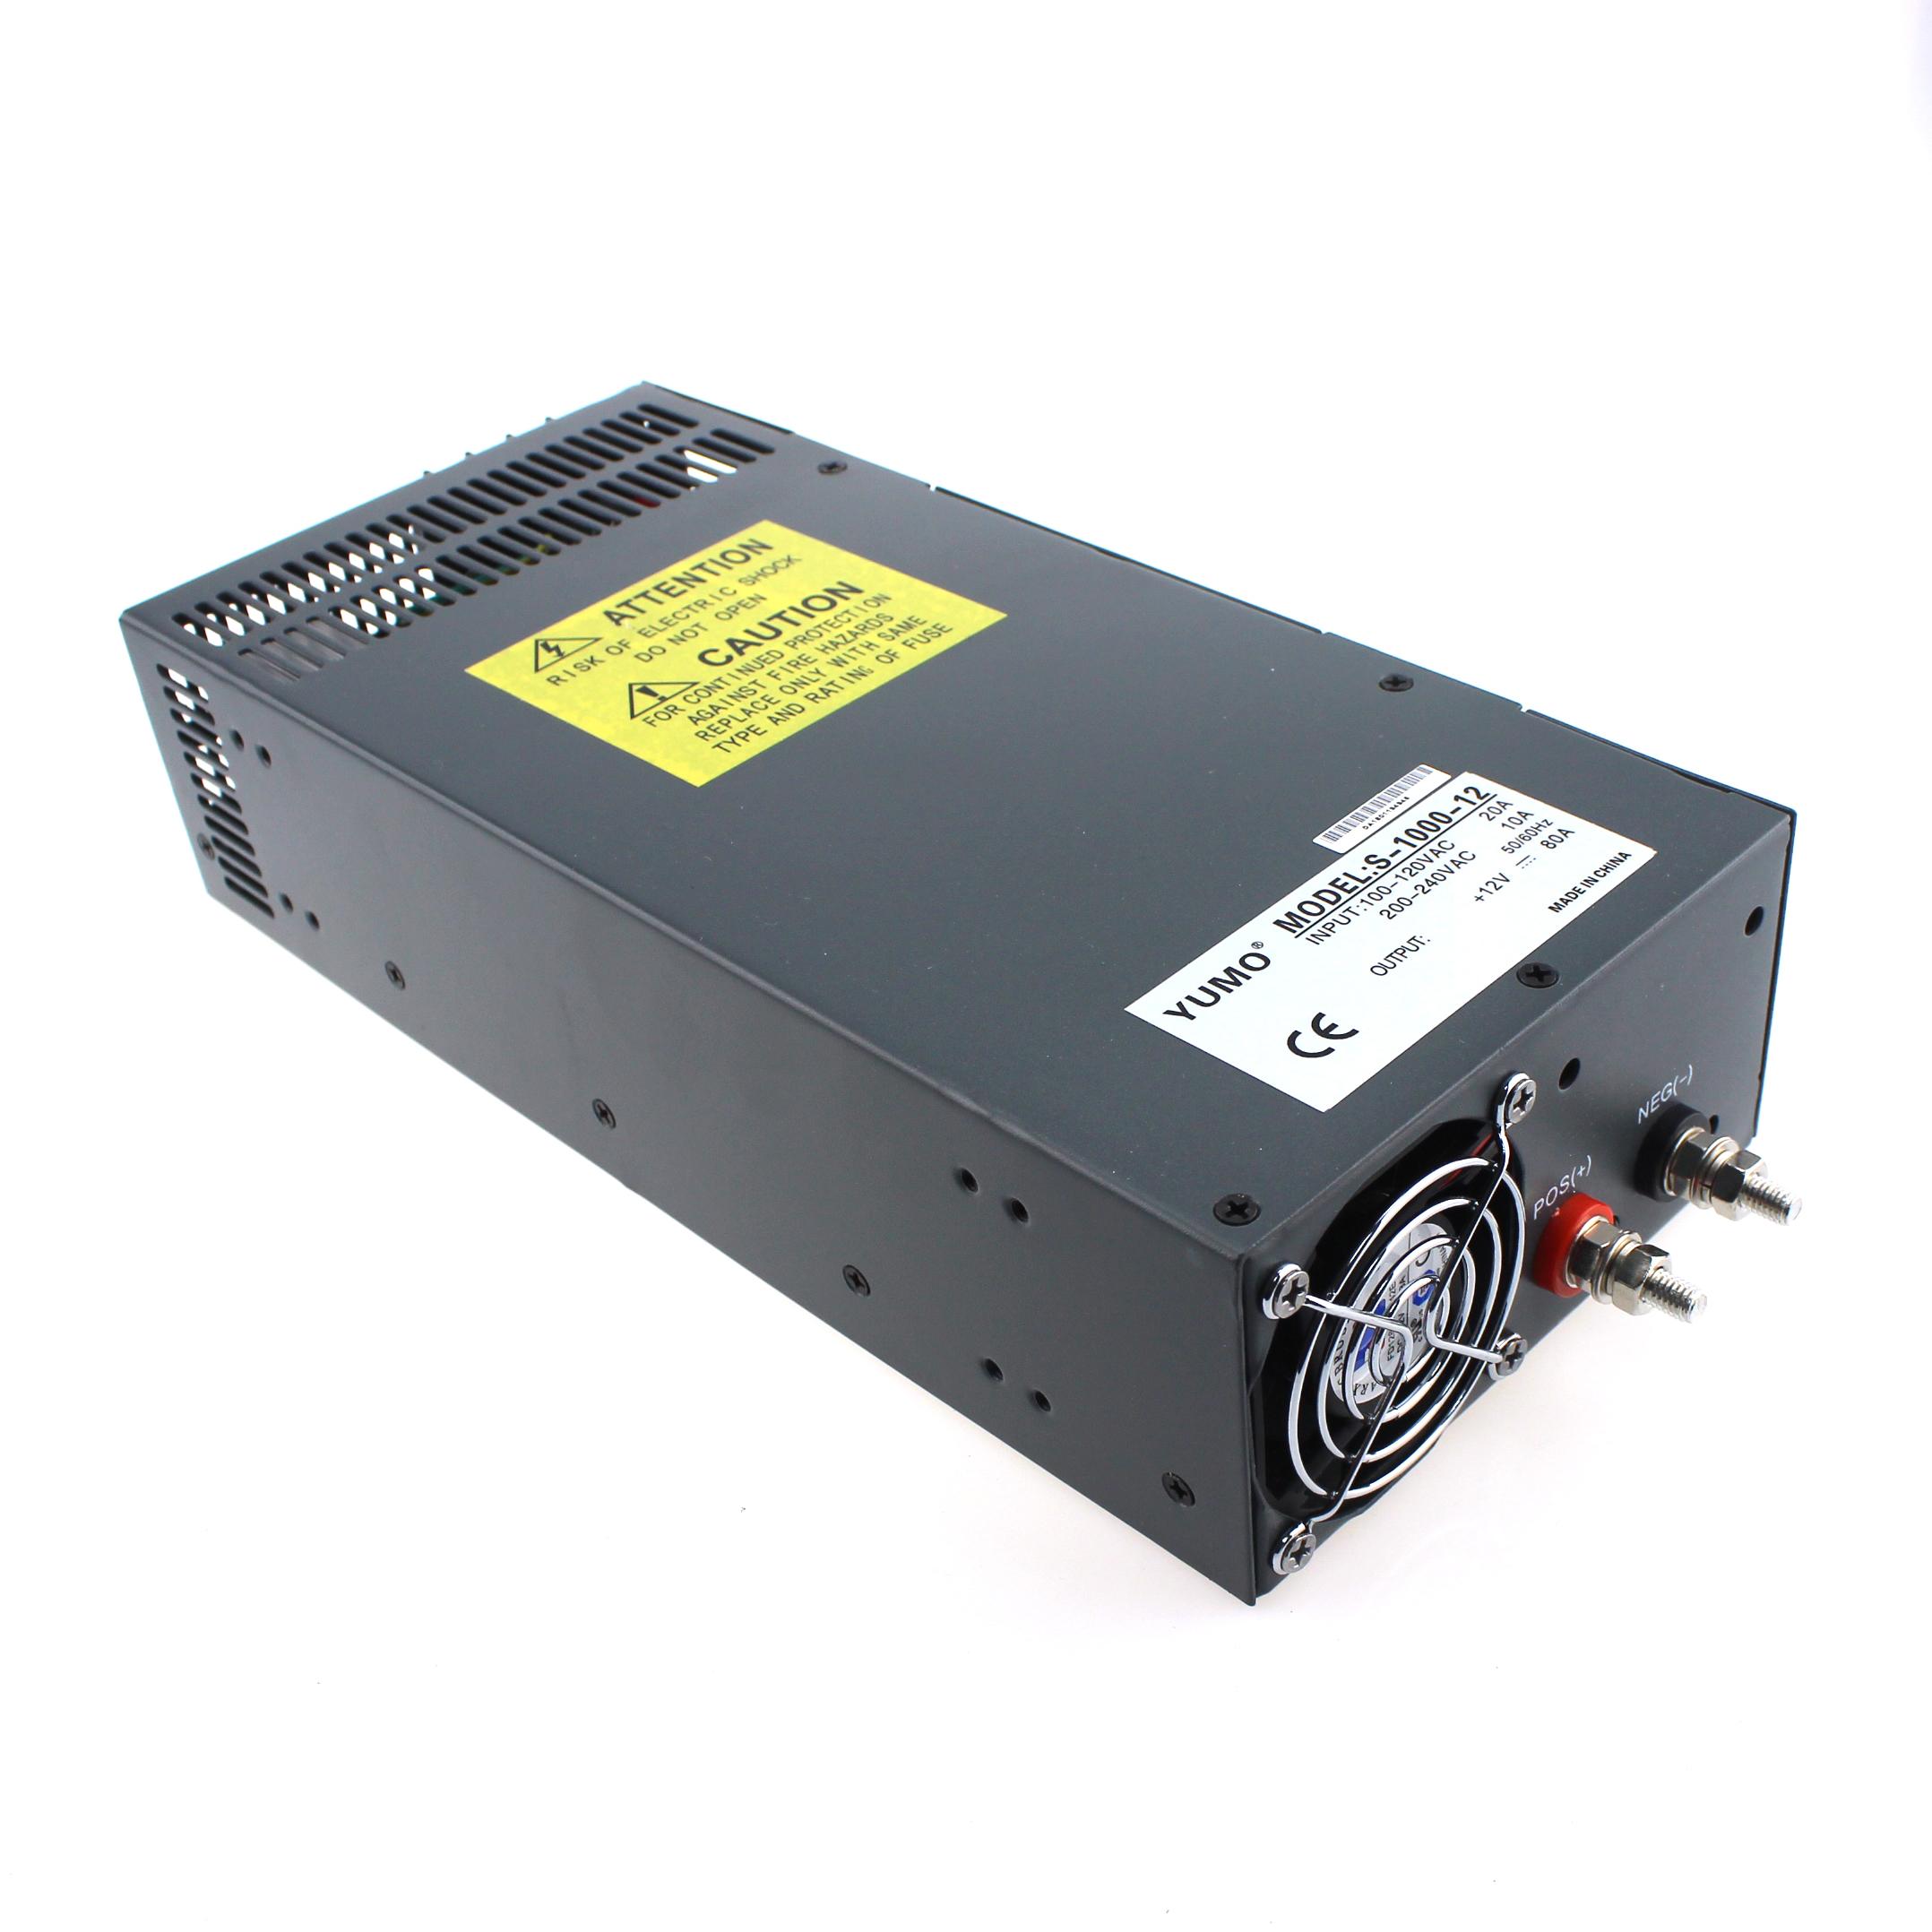 China LED Switching Power Supply,12V Switching Power Supply ...